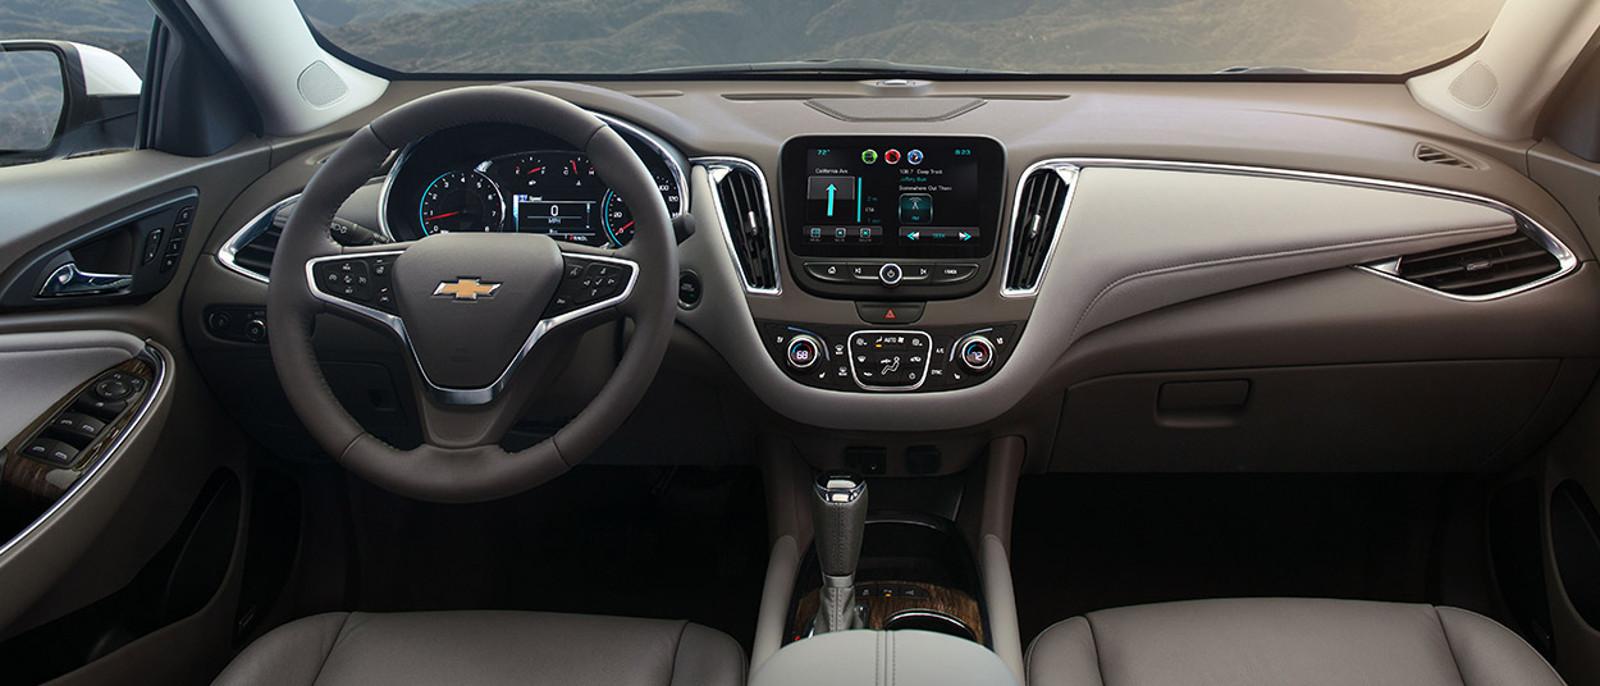 2016 Chevy Malibu Limited